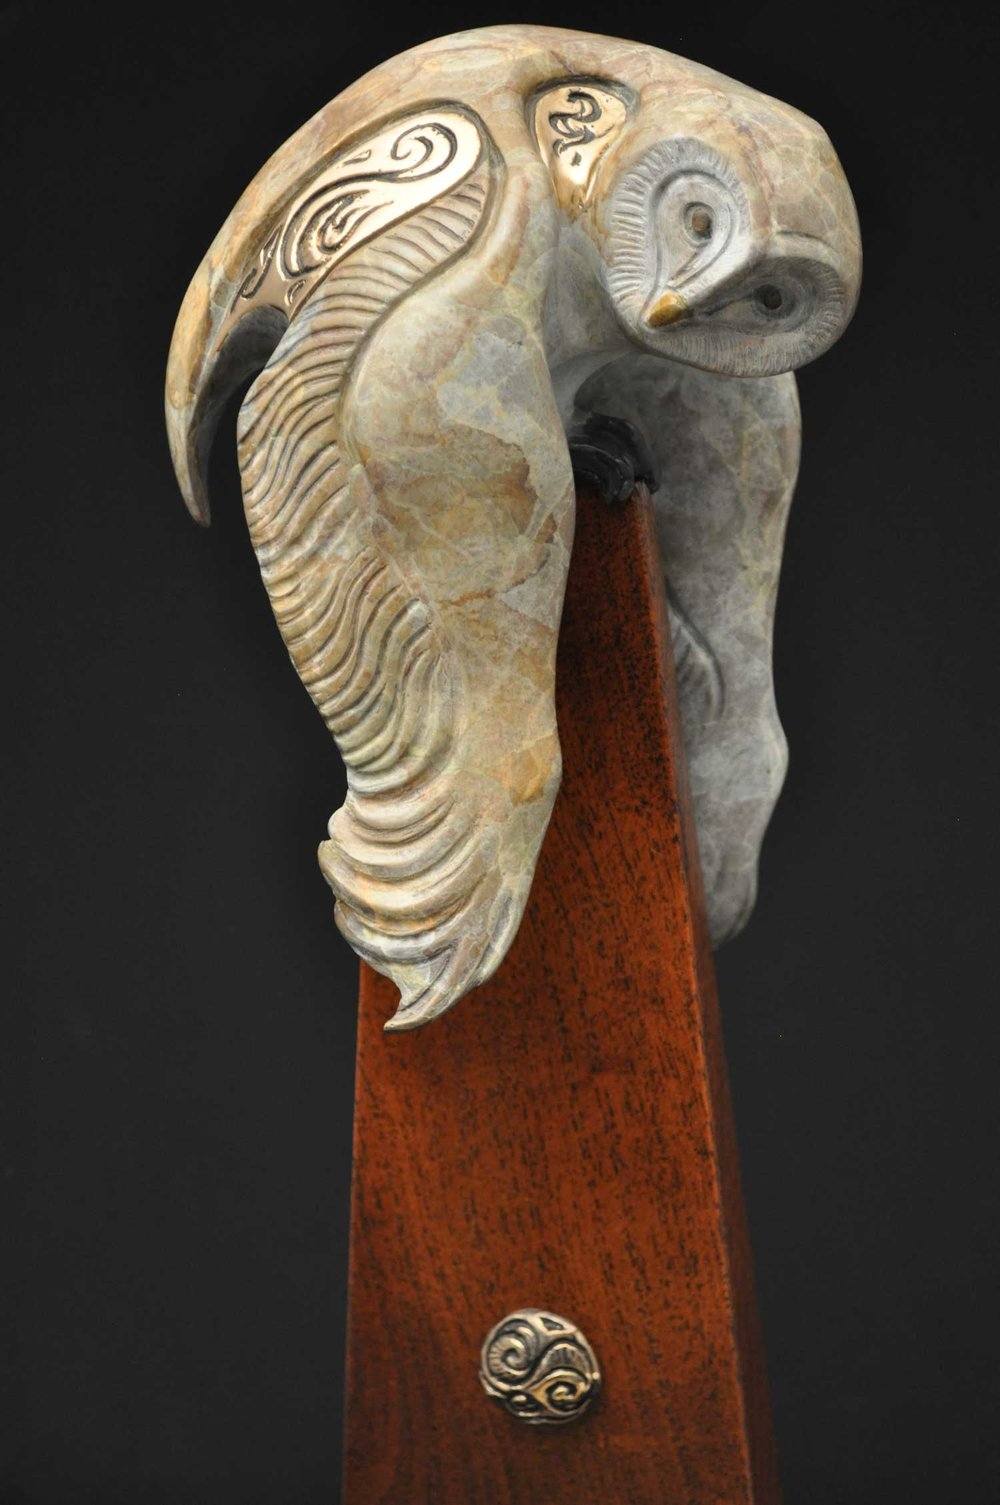 bronze-owl-sculpture-john-maisano---90.jpg